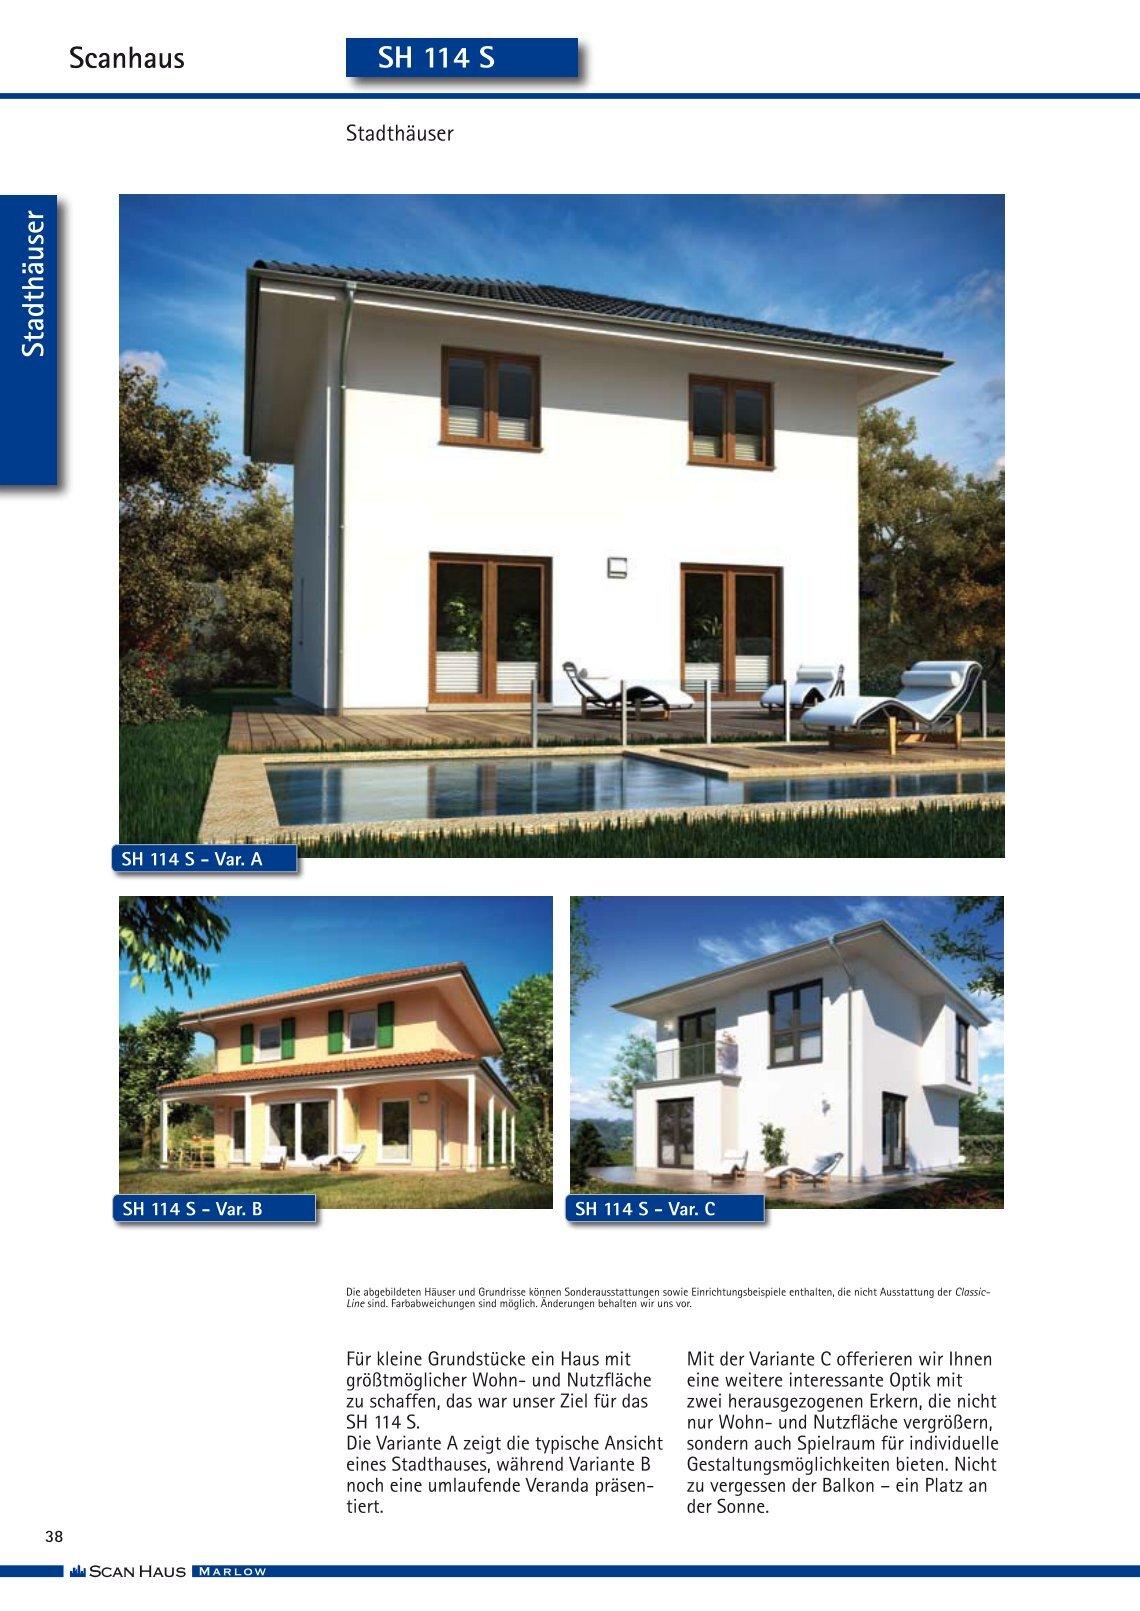 scanhaus marlow bungalow wohn design. Black Bedroom Furniture Sets. Home Design Ideas